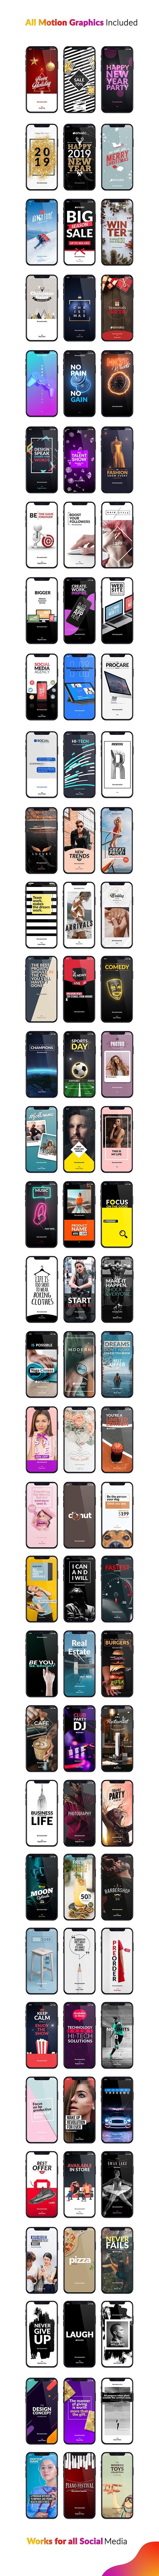 Instagram Stories Package Essential Graphics | Mogrt - 10